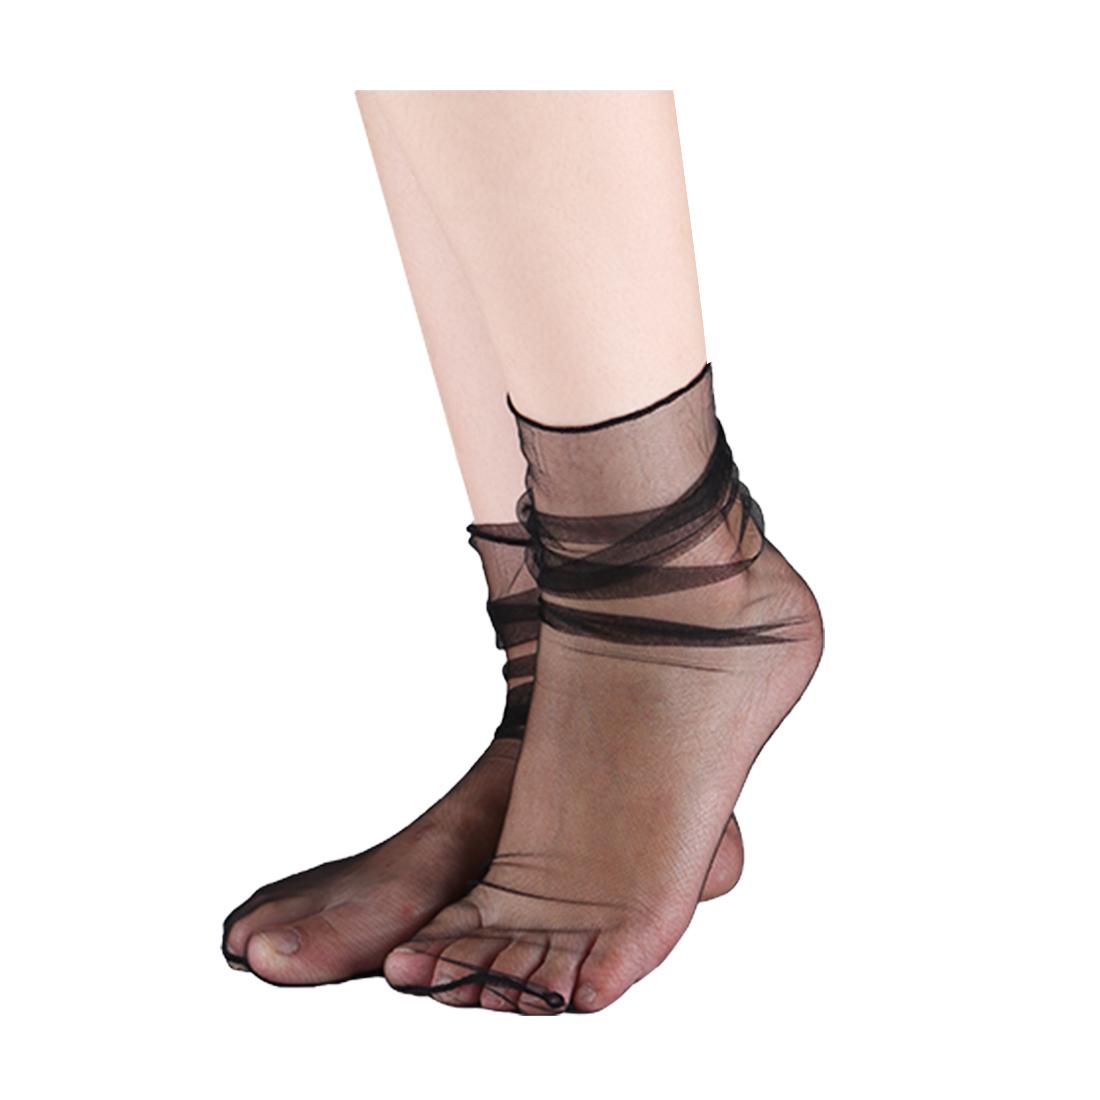 Women 10 Packs Lace Translucent Breathable Ankle High Sheer Socks Mesh Black